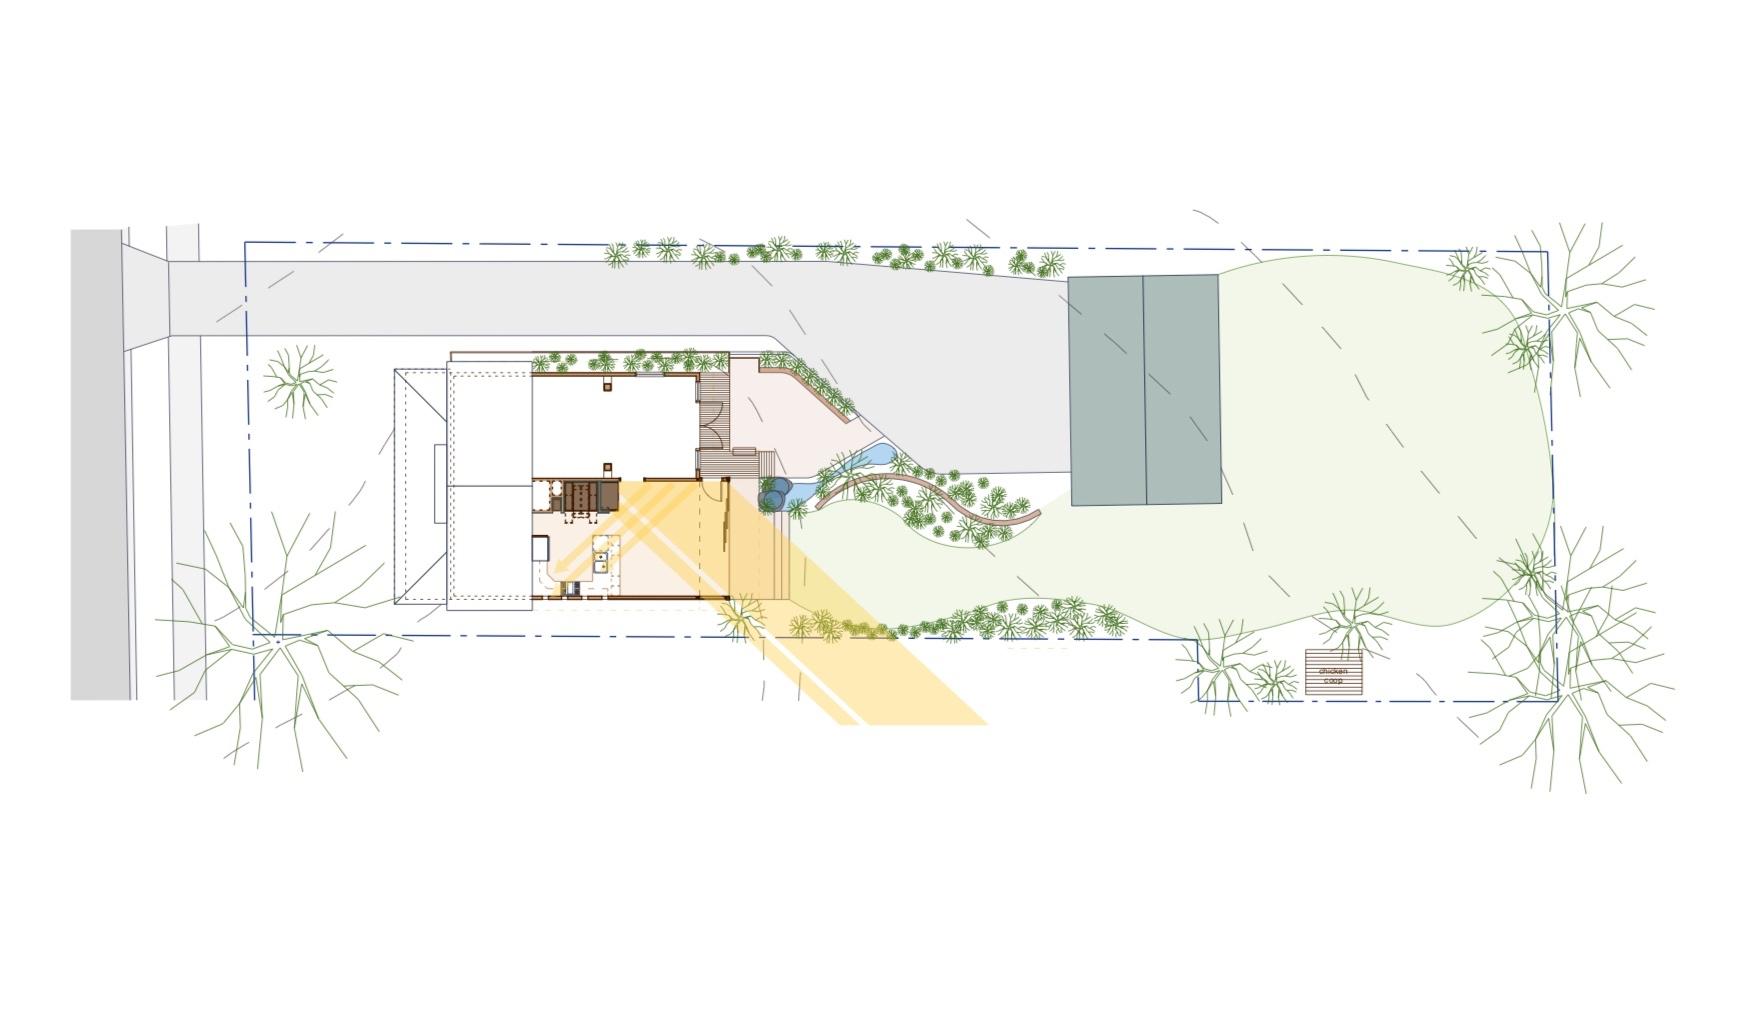 3_site plan_yu.jpg